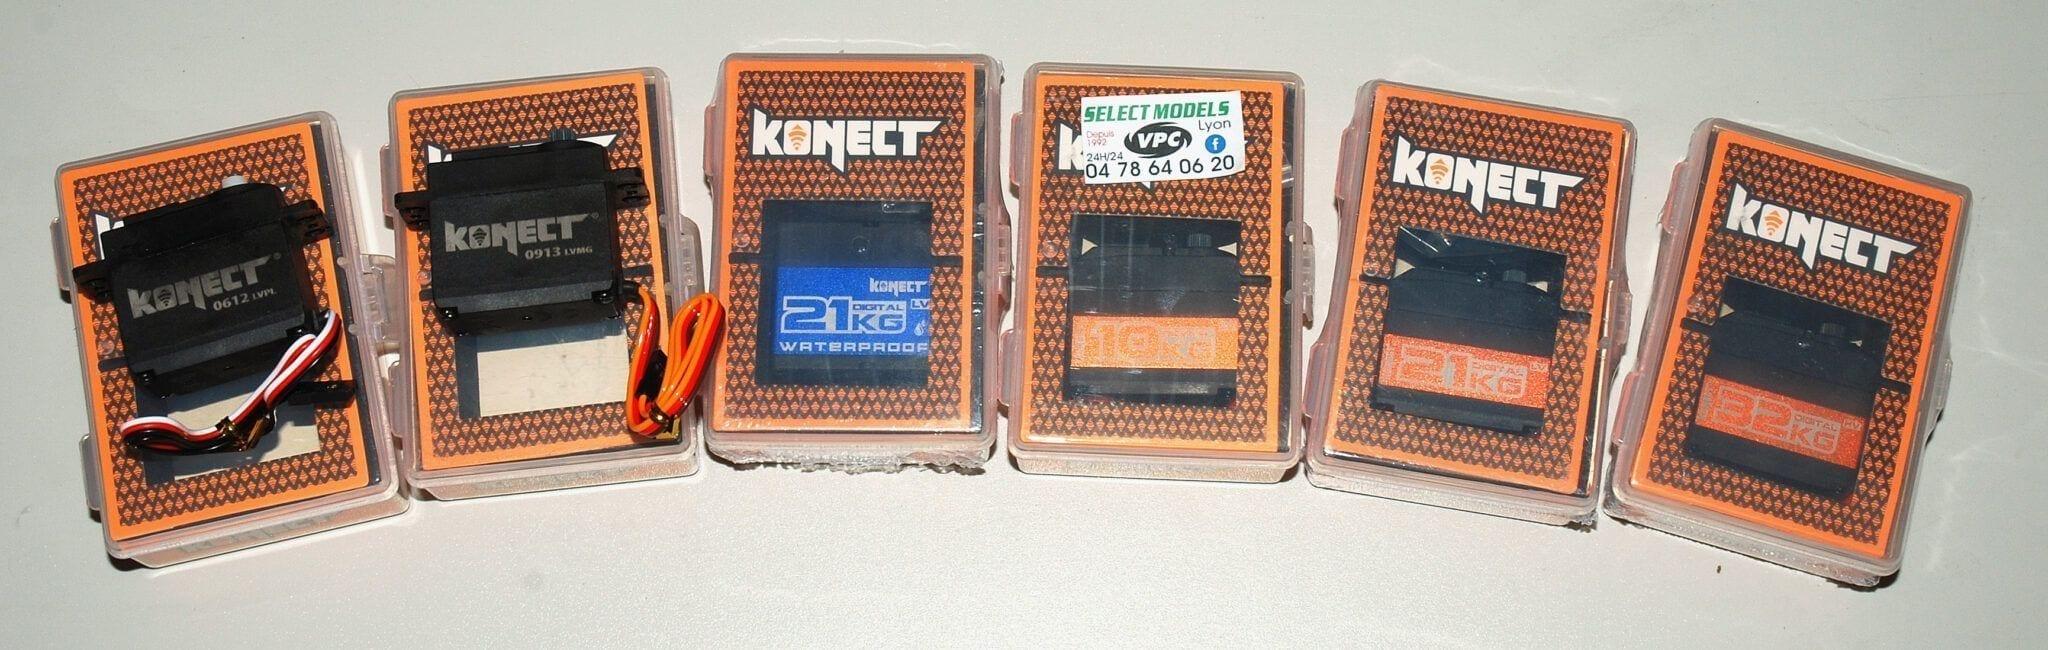 Toute la gamme des servos Konect